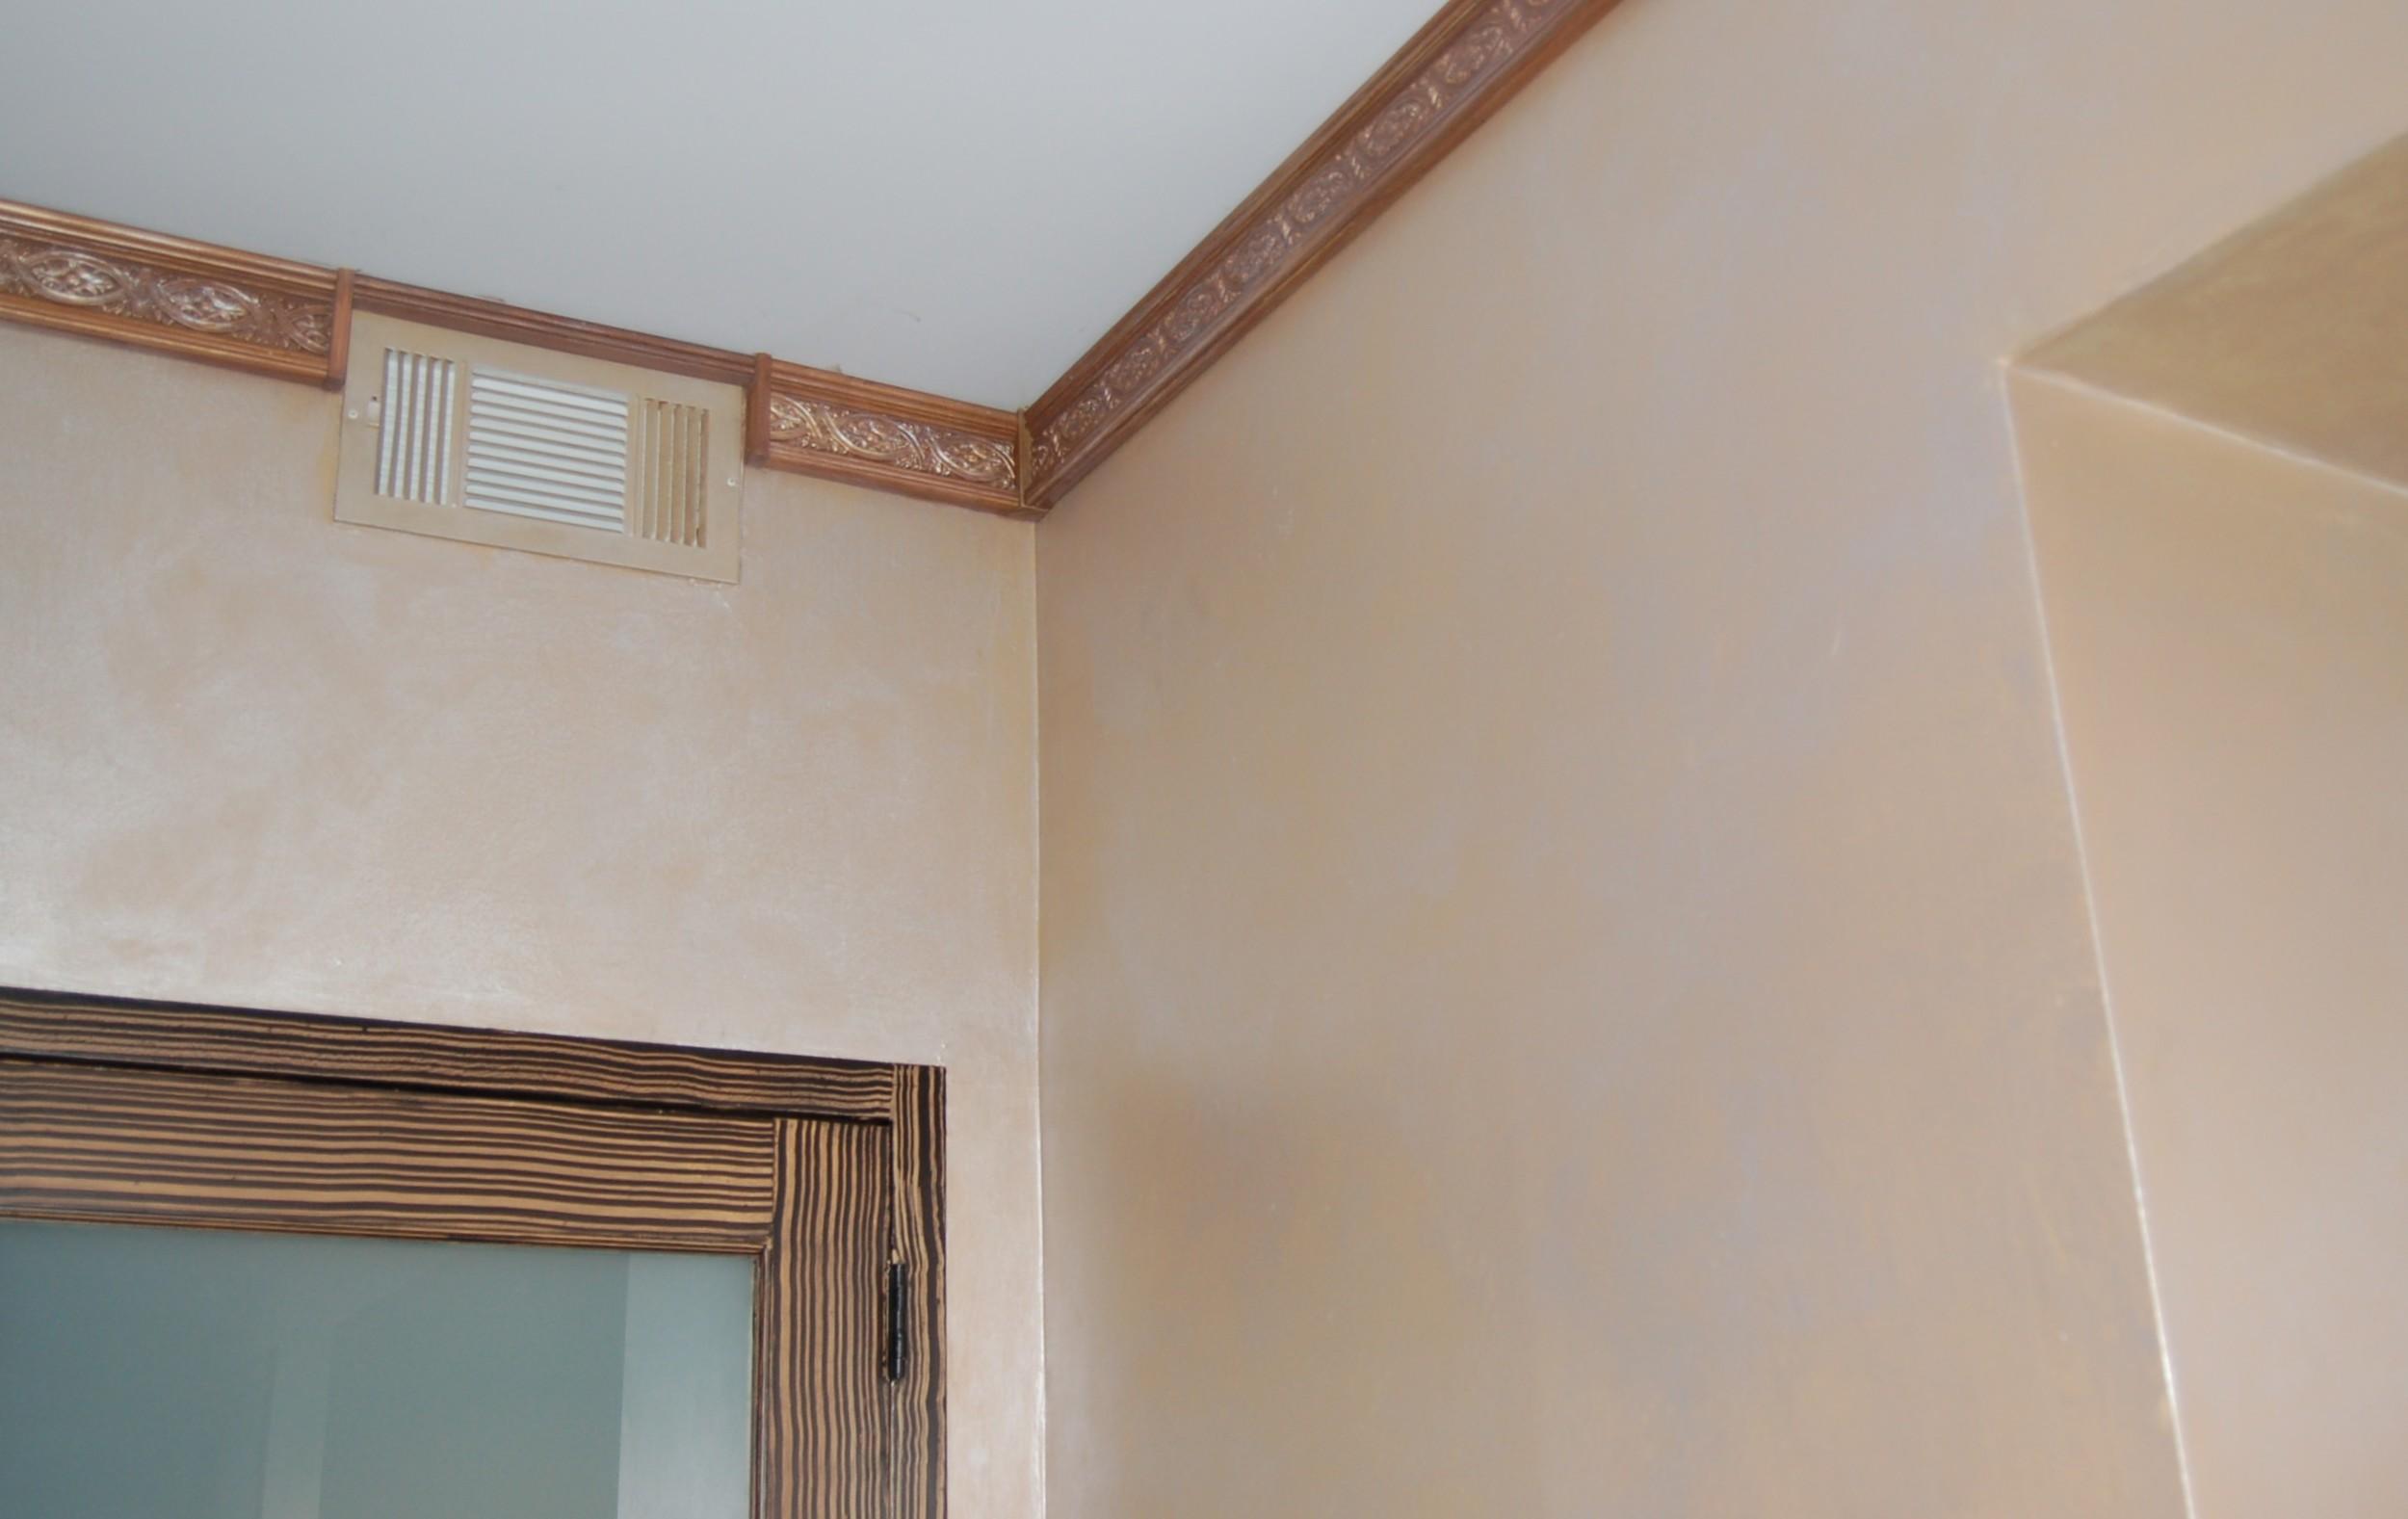 detal of pearlescent wall.jpg